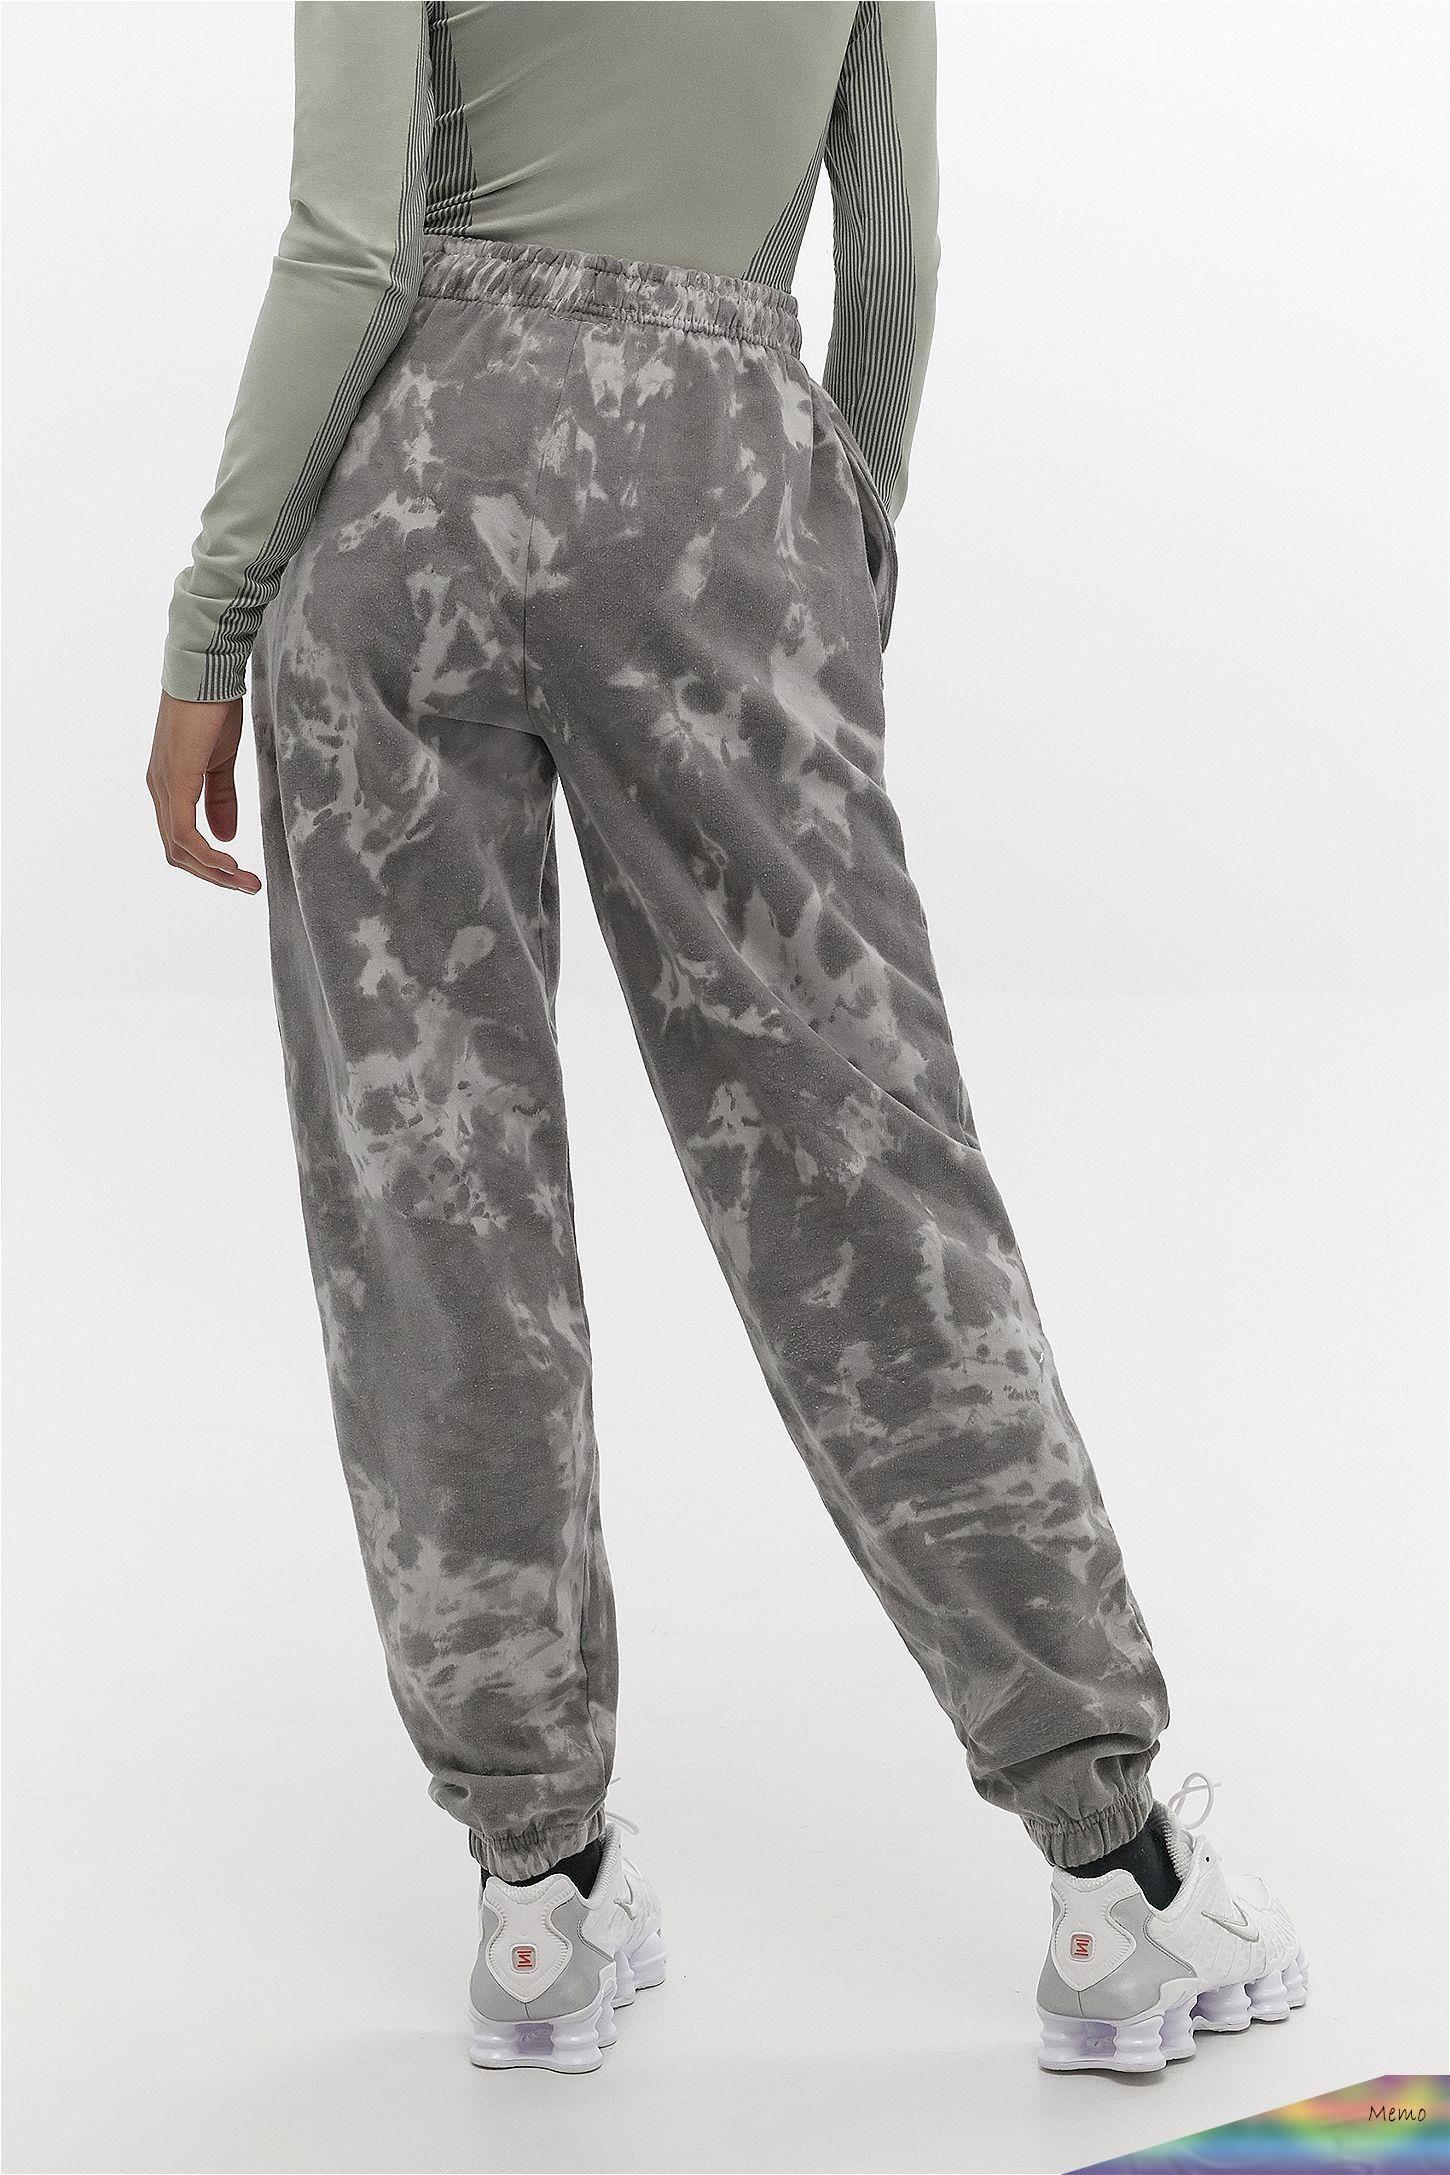 May 3 2020 Iets Frans Grey Tie Dye Joggers Urban Outfitters Uk Grey Tie Dye Tie Dye Outfits Grey Sweatpants